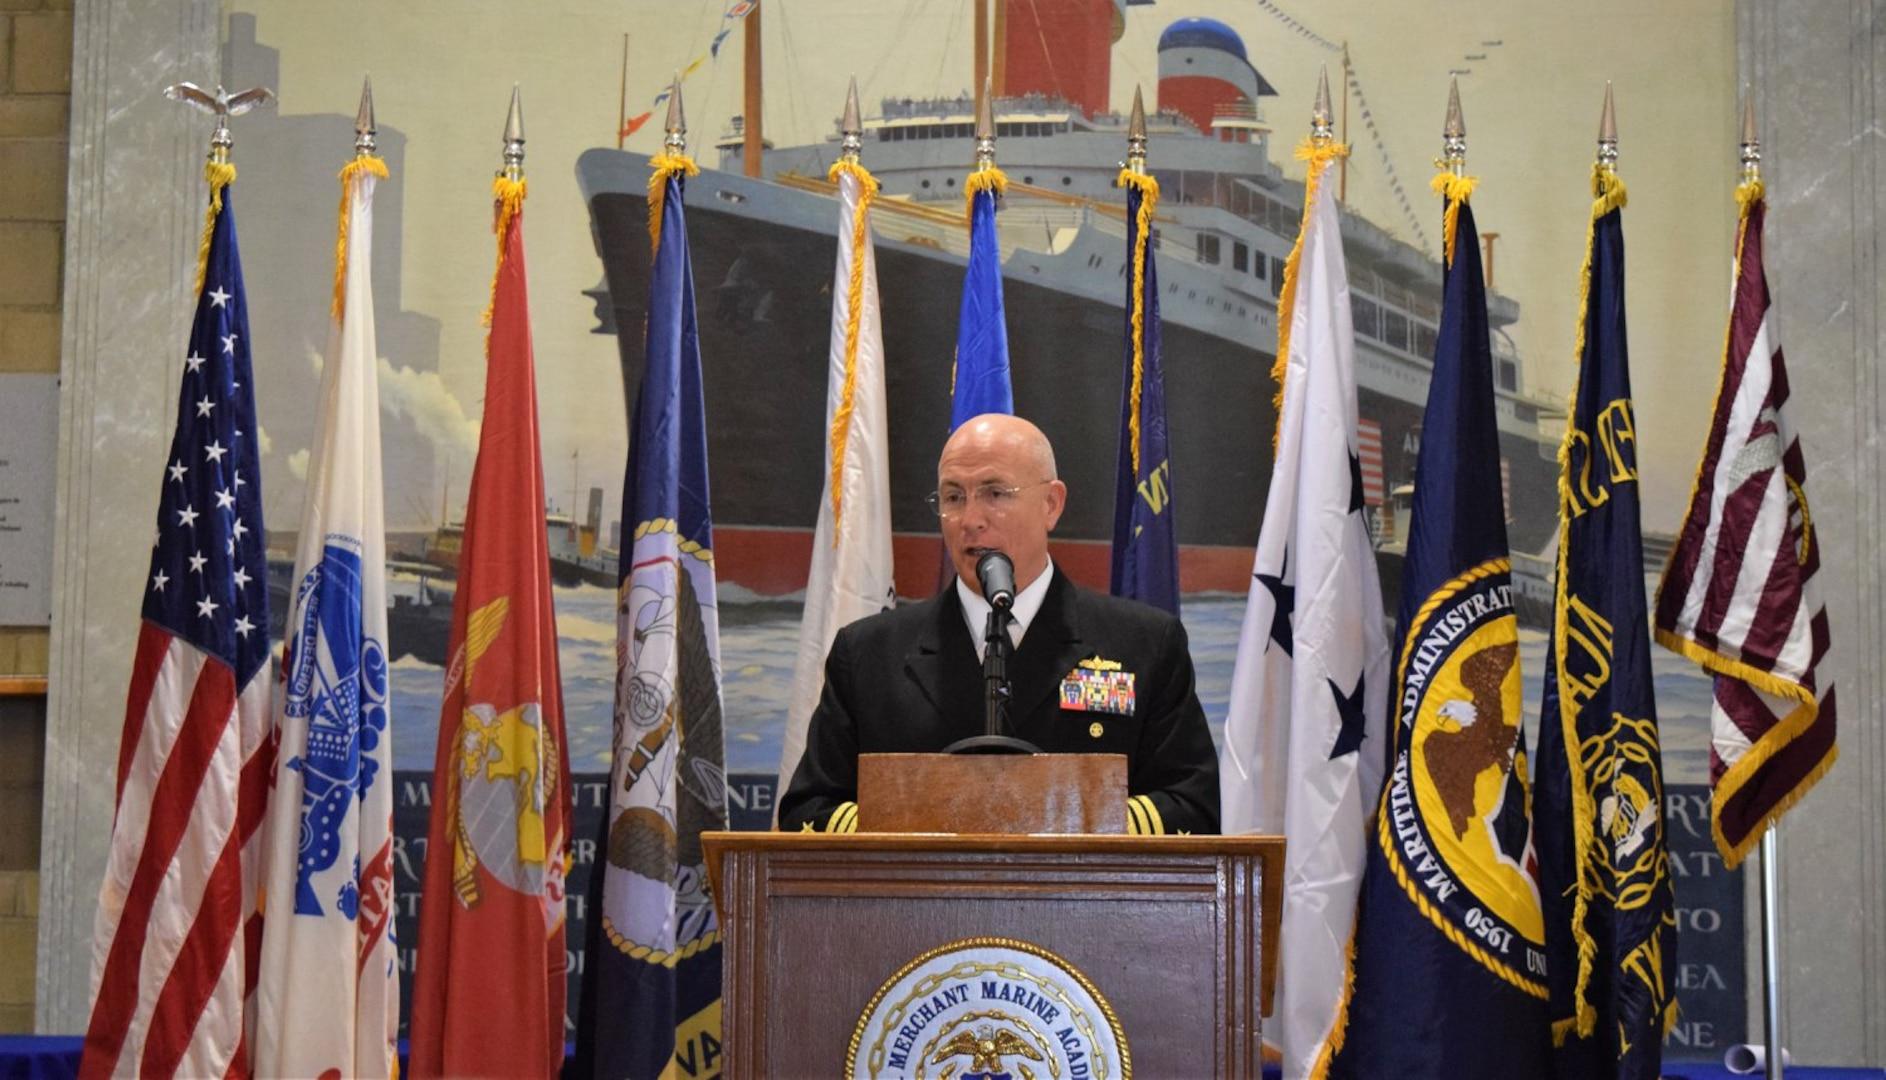 Admiral Kurt Tidd speaks at the U.S. Merchant Marine Academy.